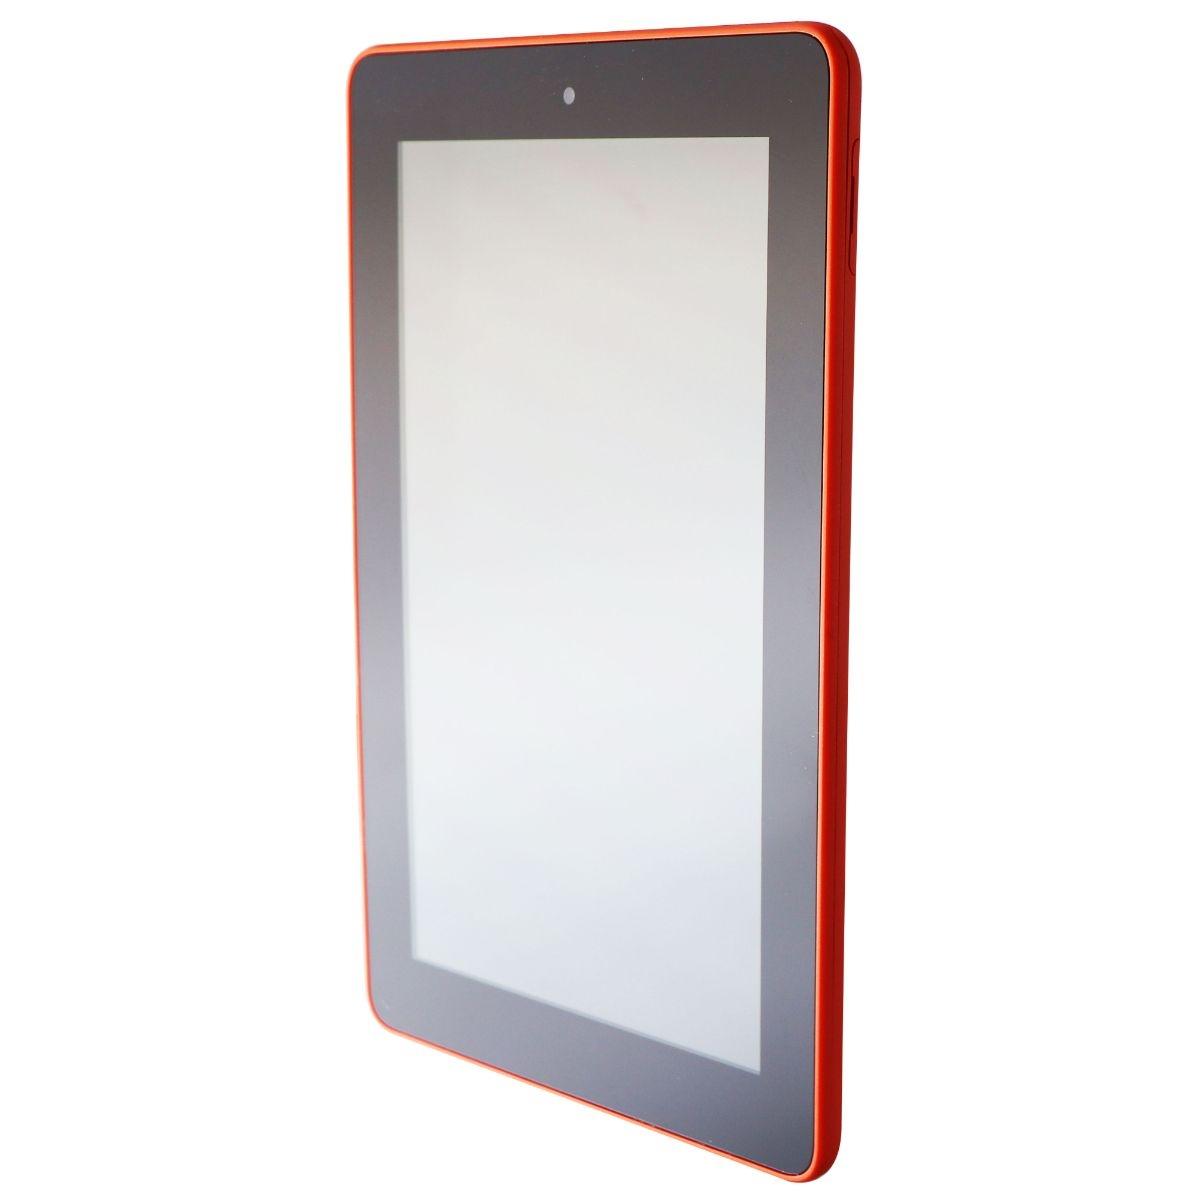 Amazon Kindle Fire 7-inch (5th Generation) Tablet - Orange / 8GB